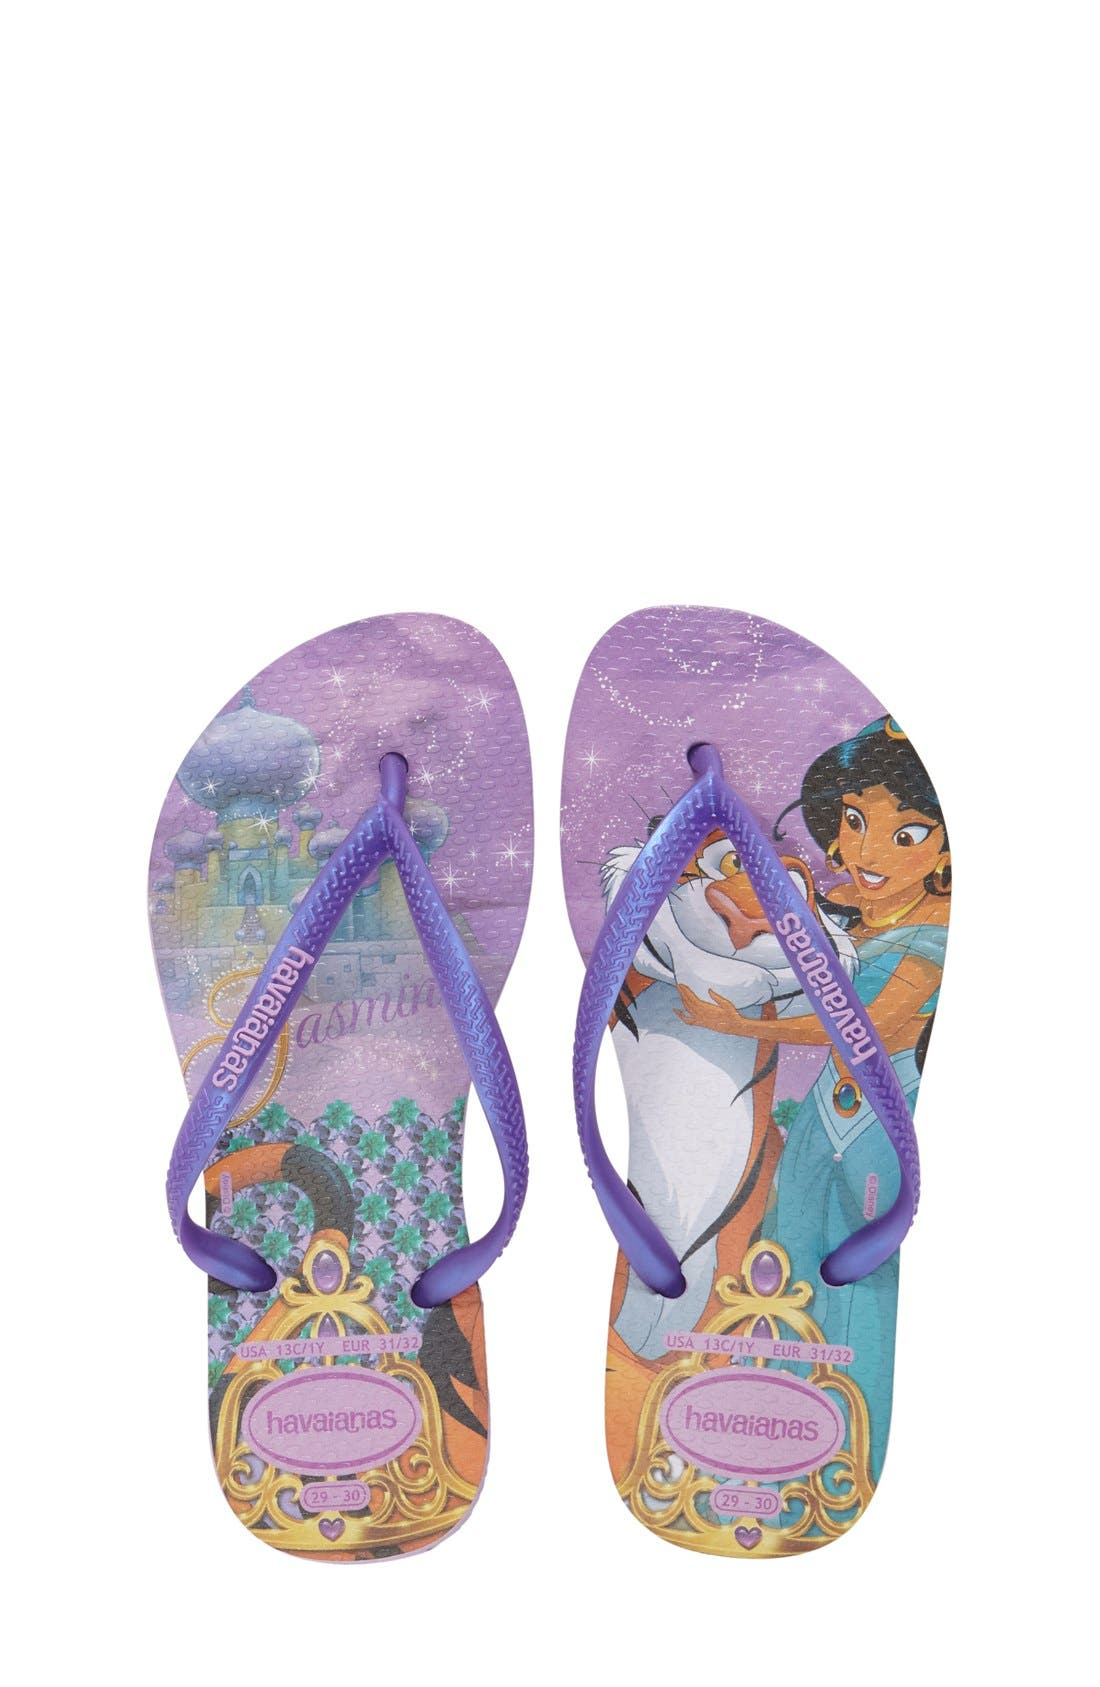 Main Image - Havaianas 'Disney Princess' Flip Flops (Toddler & Little Kid)